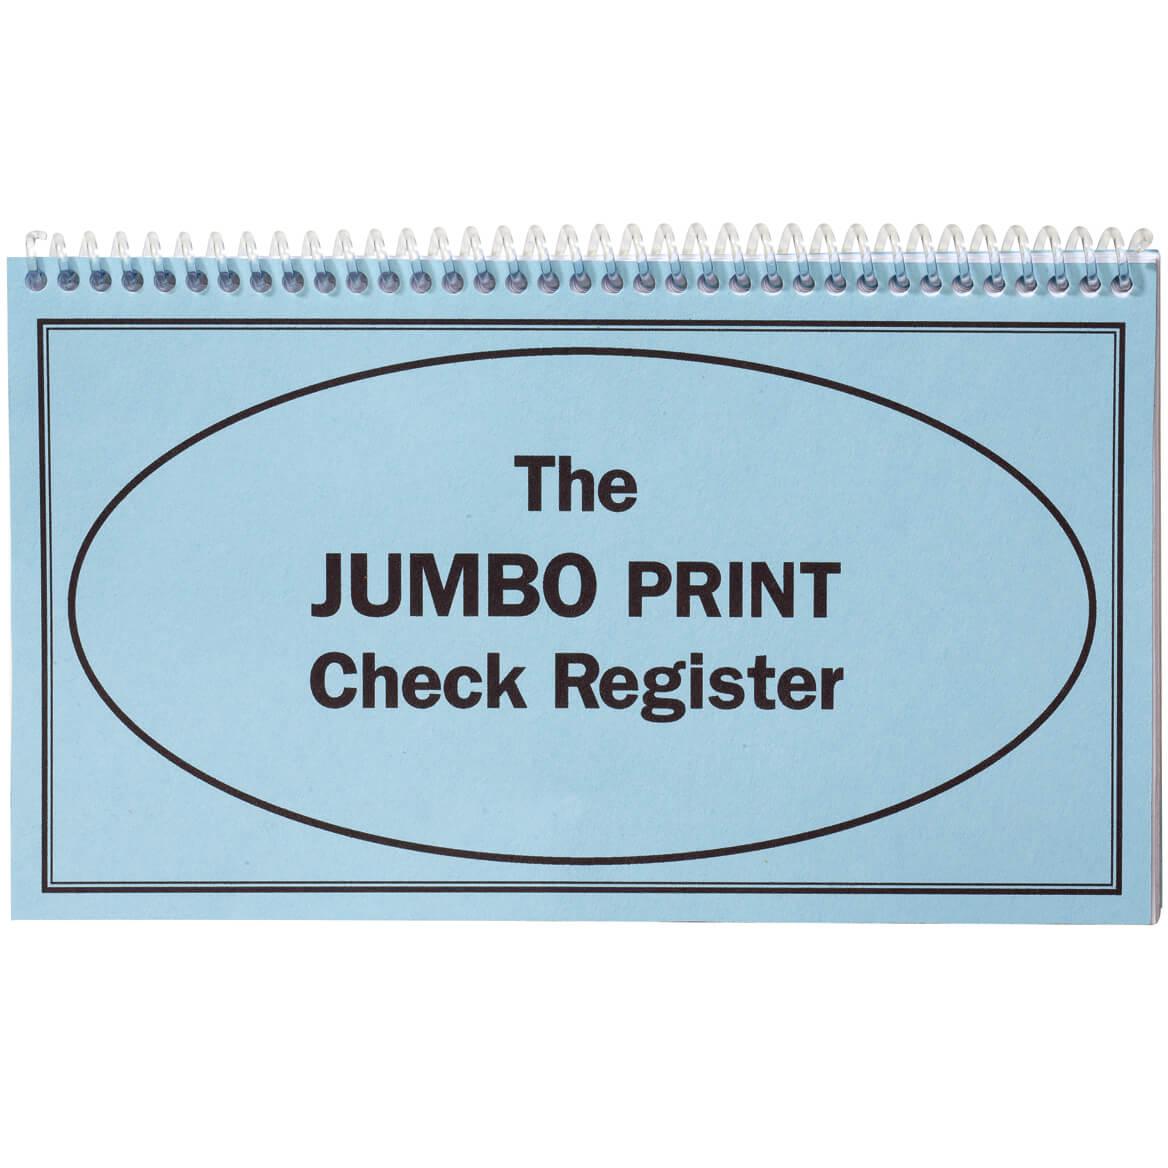 where can i get a check register book